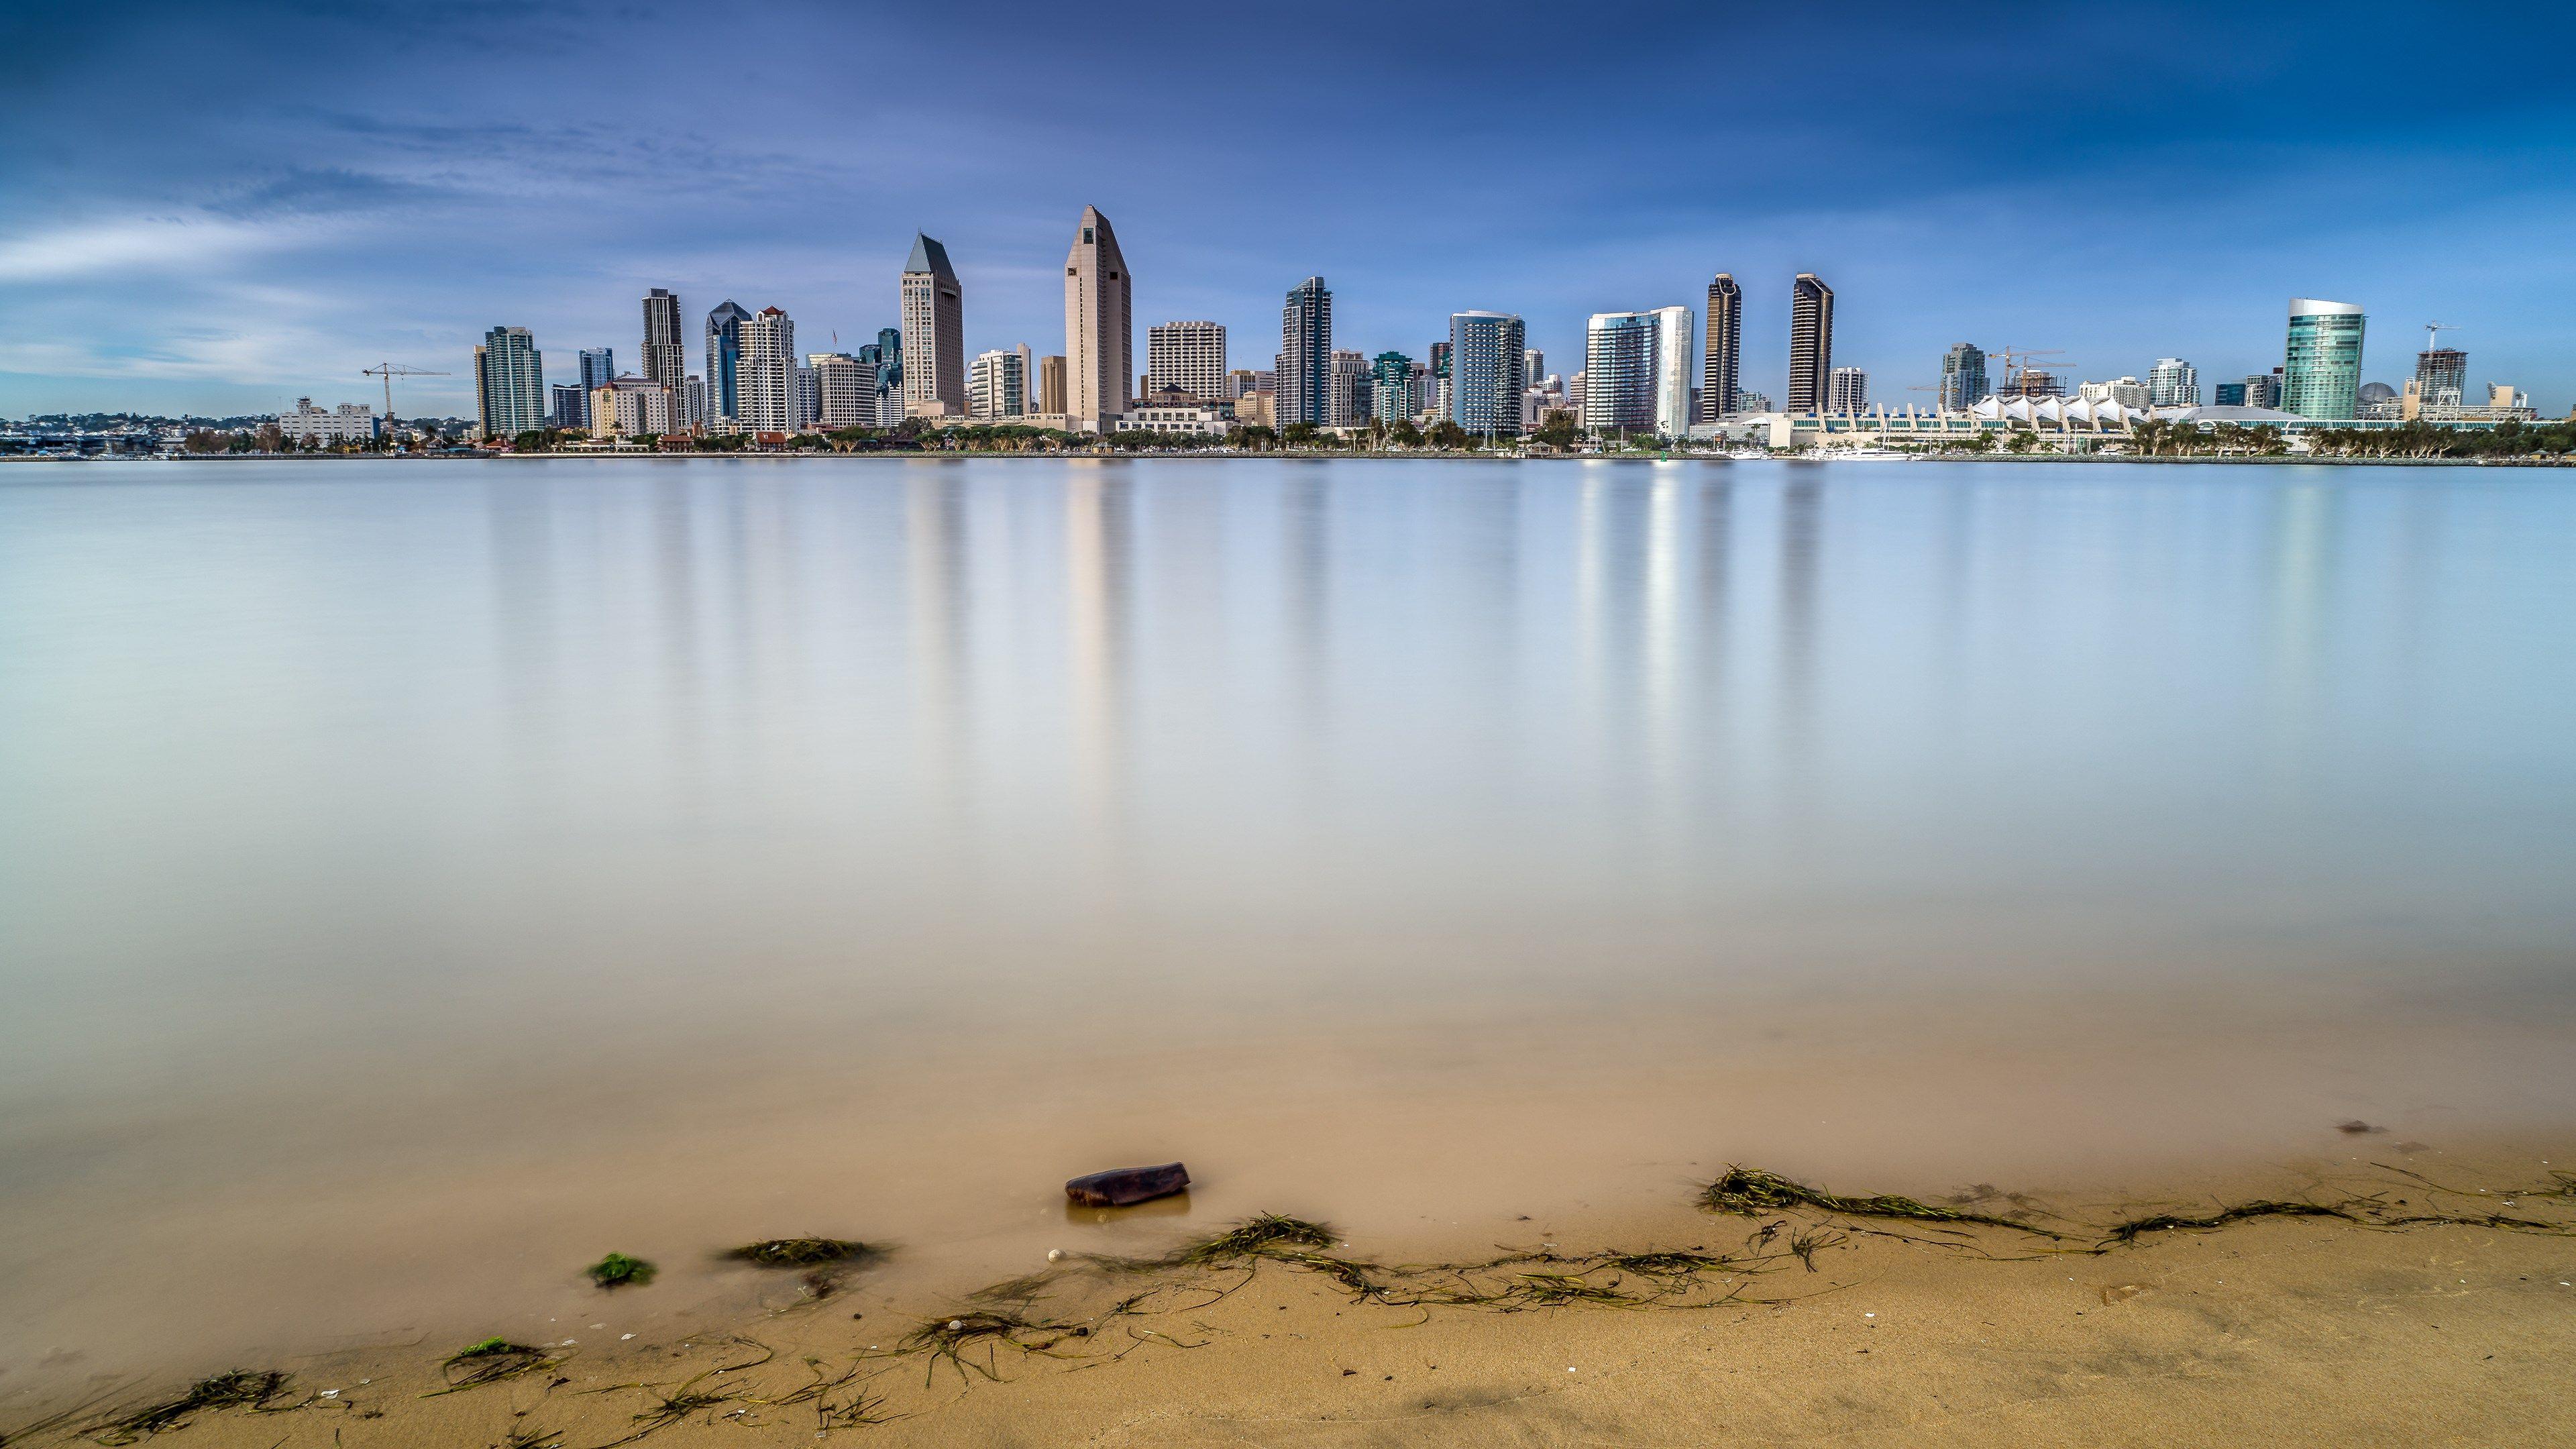 4k best photos for wallpaper (3840x2160) San diego